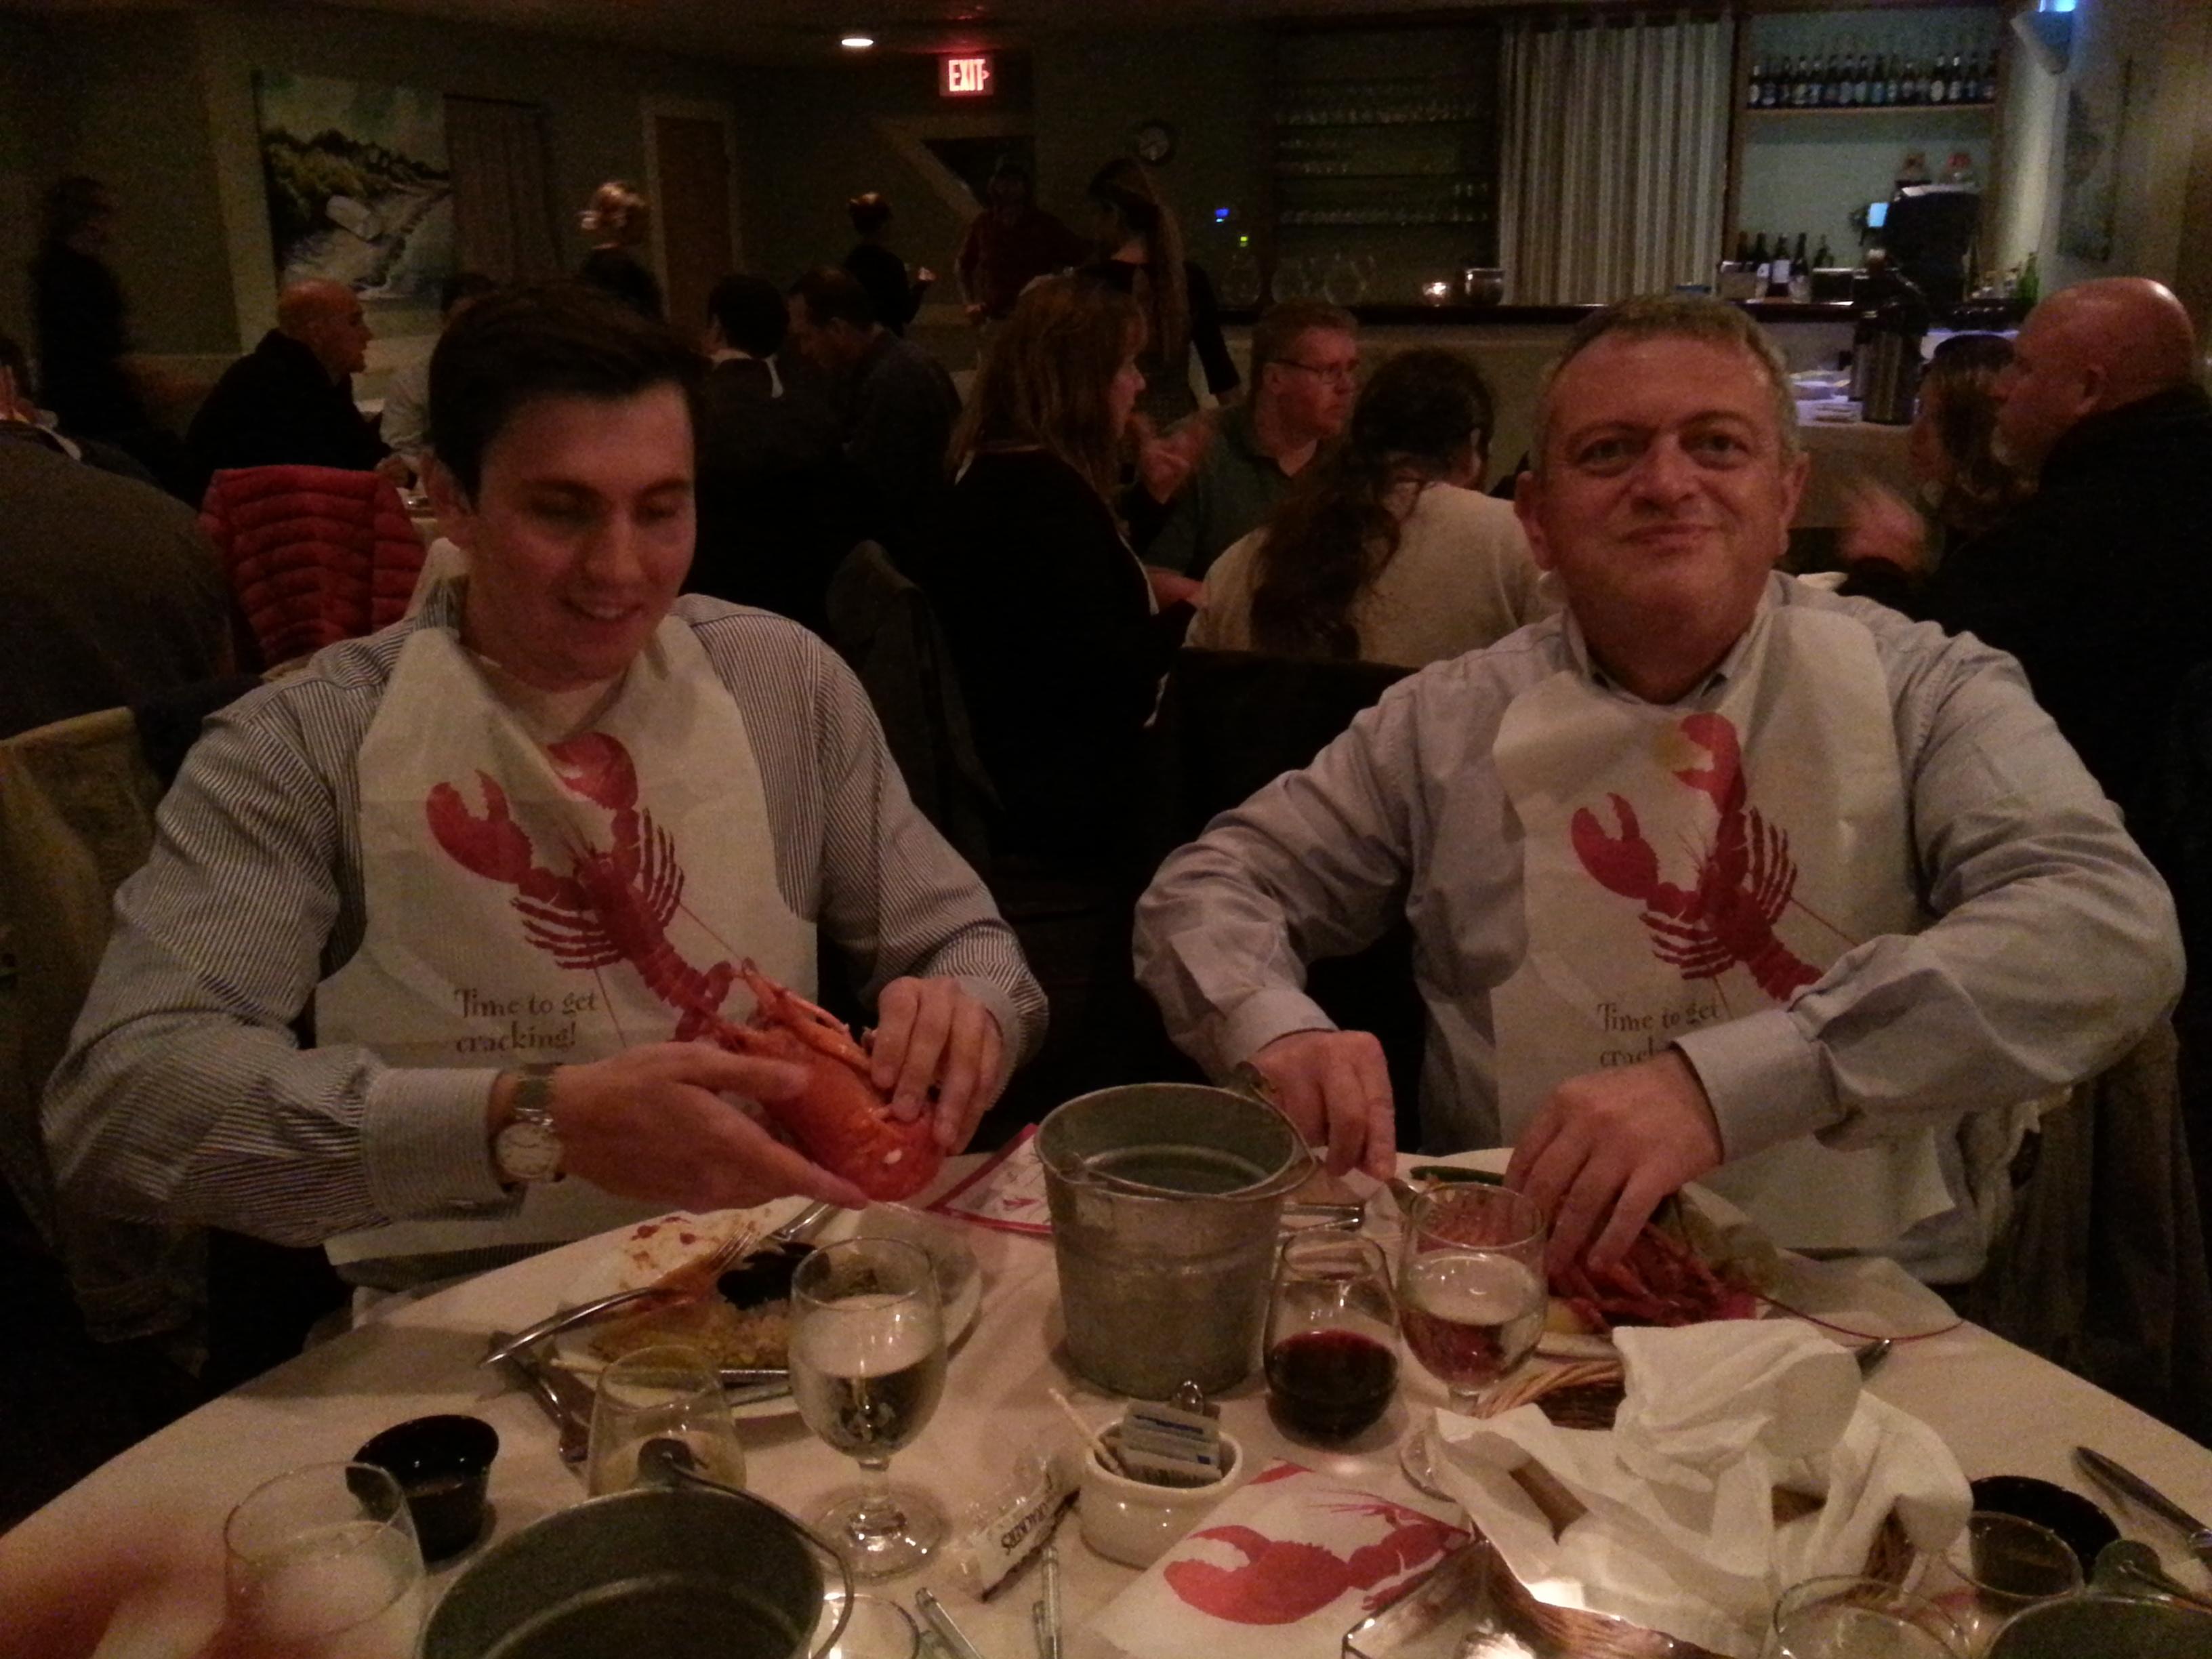 Seminar attendees enjoyed the lobster buffet.